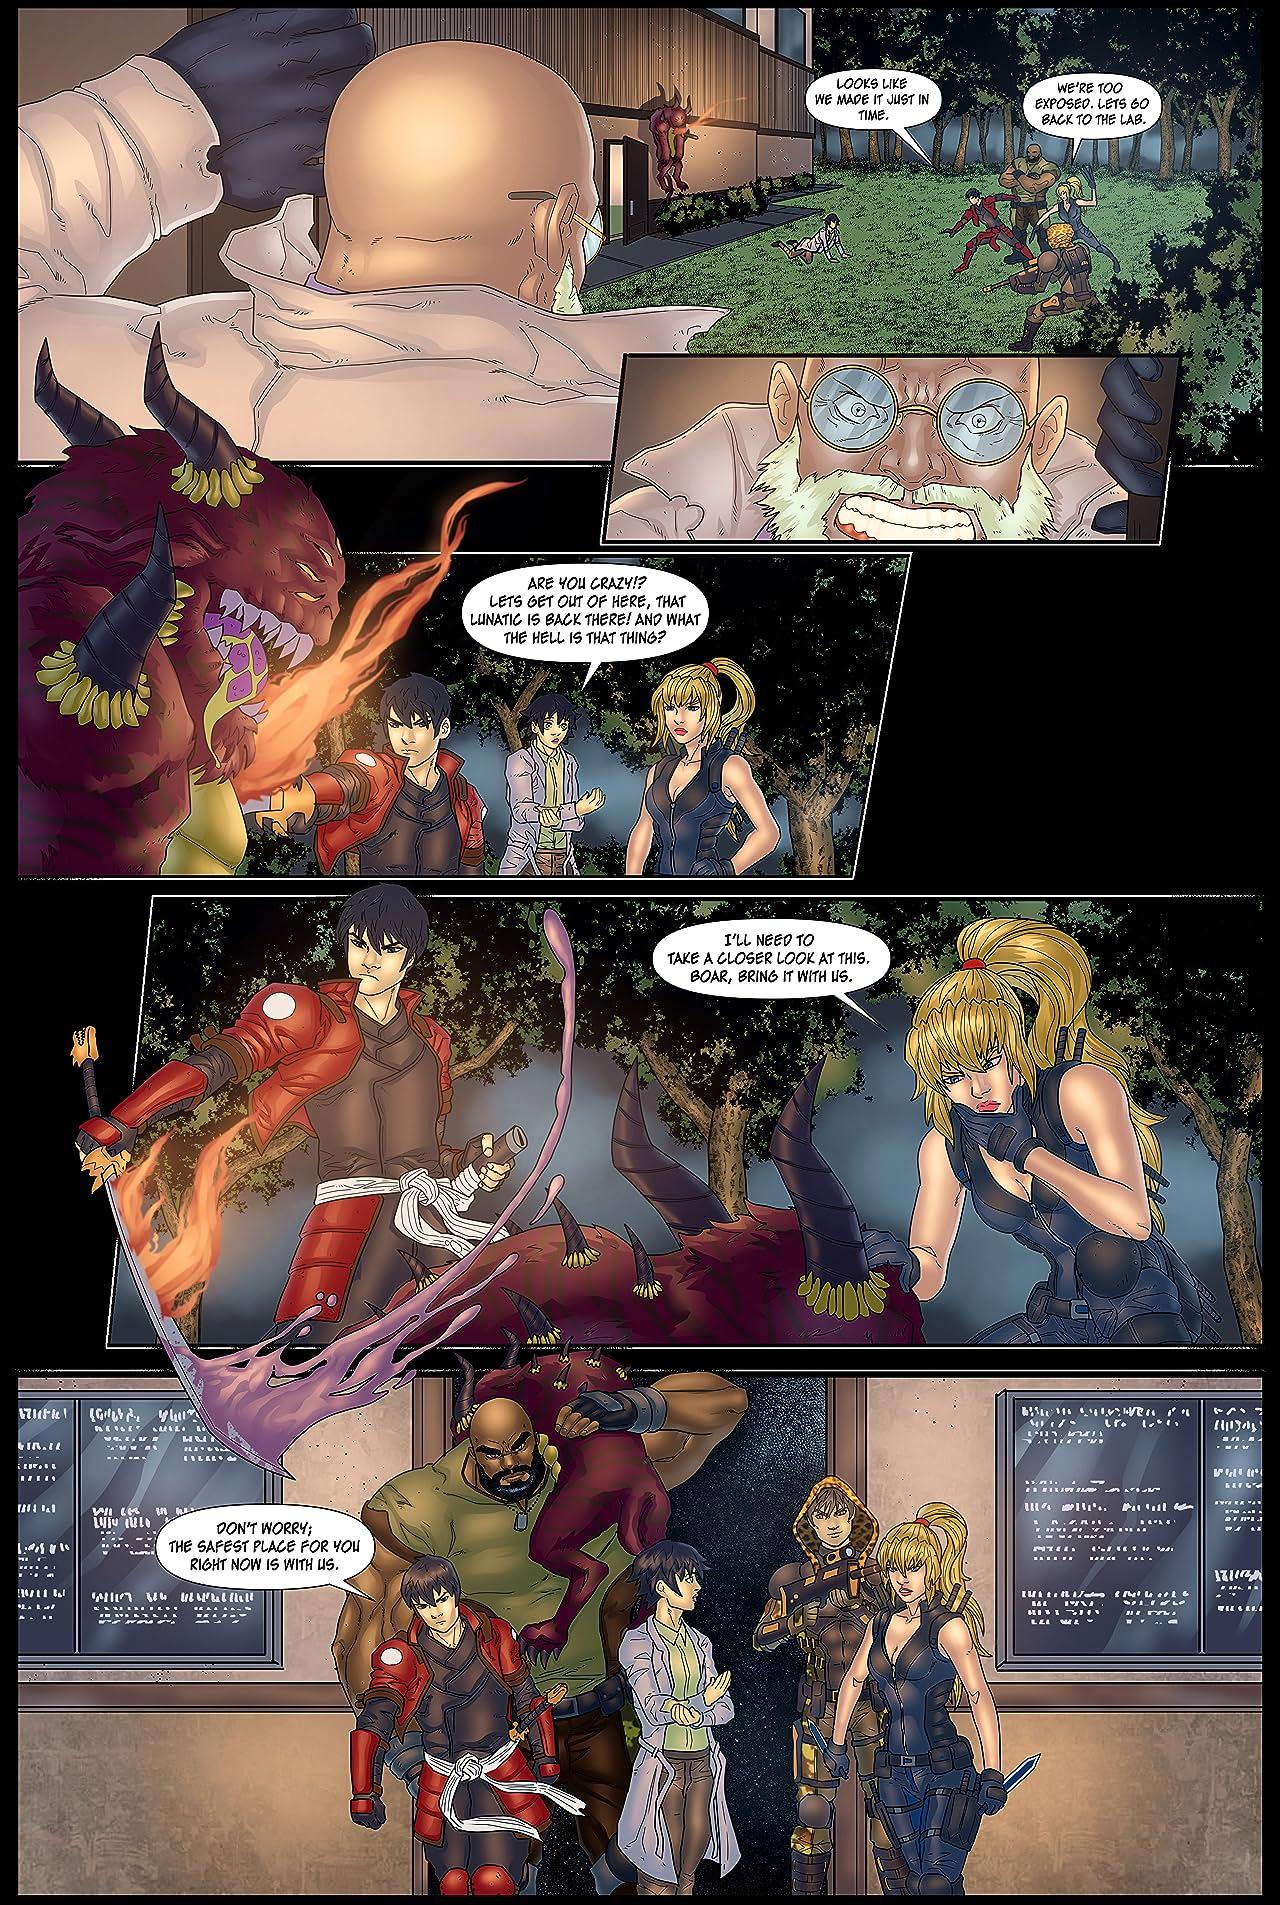 The Savage Beasts #2